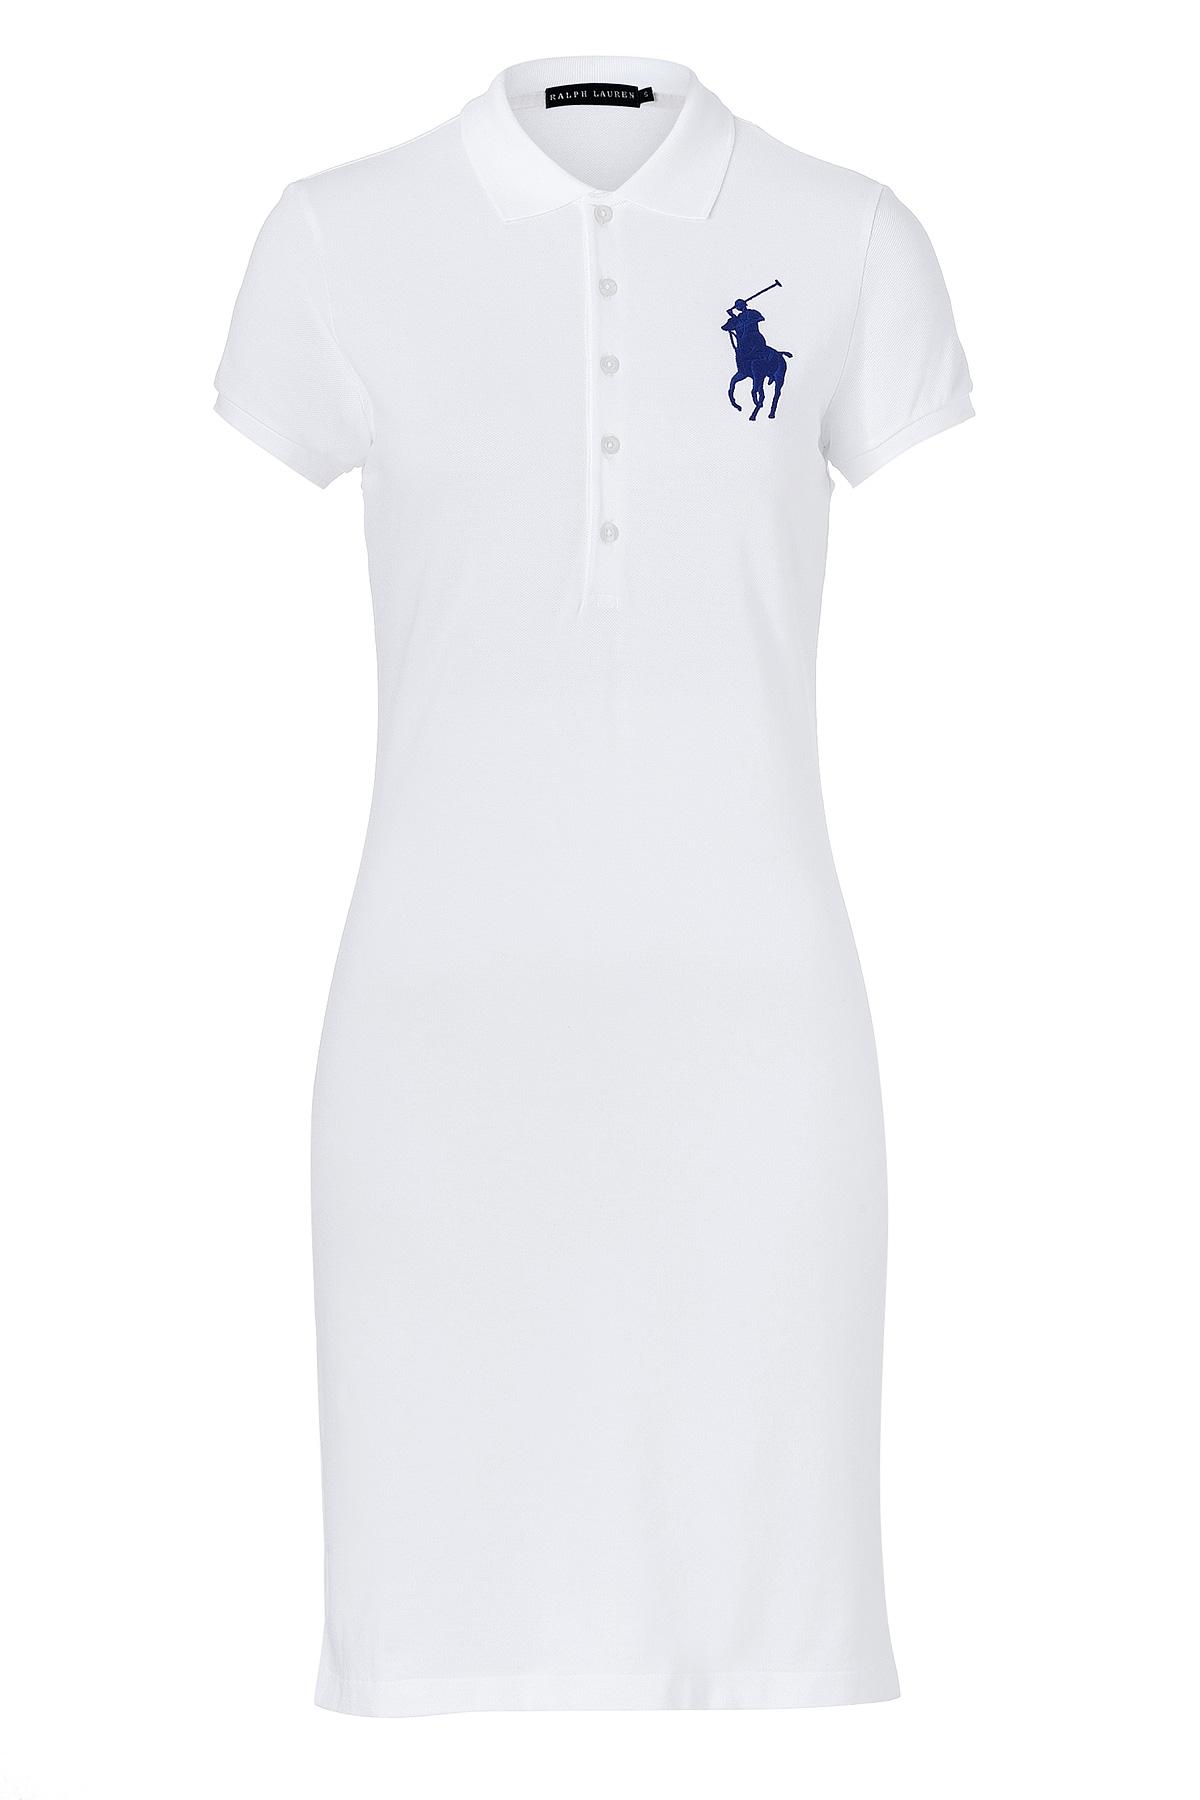 38ef074b7a41f Ralph lauren White Cotton Stretch Big Pony Mesh Polo Dress in White